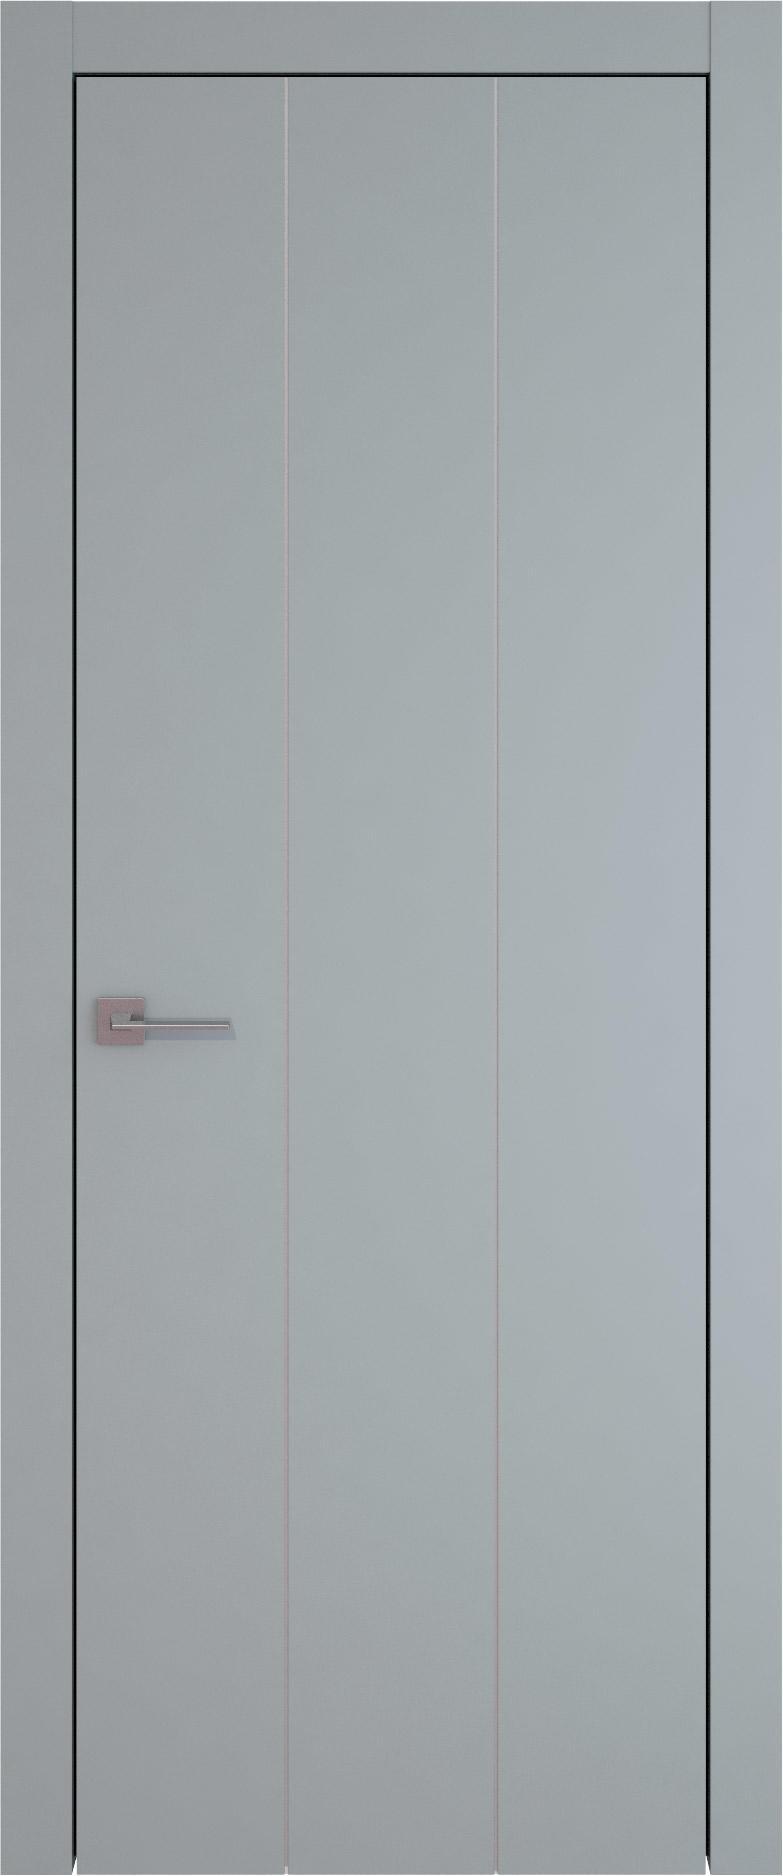 Tivoli Б-1 цвет - Серебристо-серая эмаль (RAL 7045) Без стекла (ДГ)